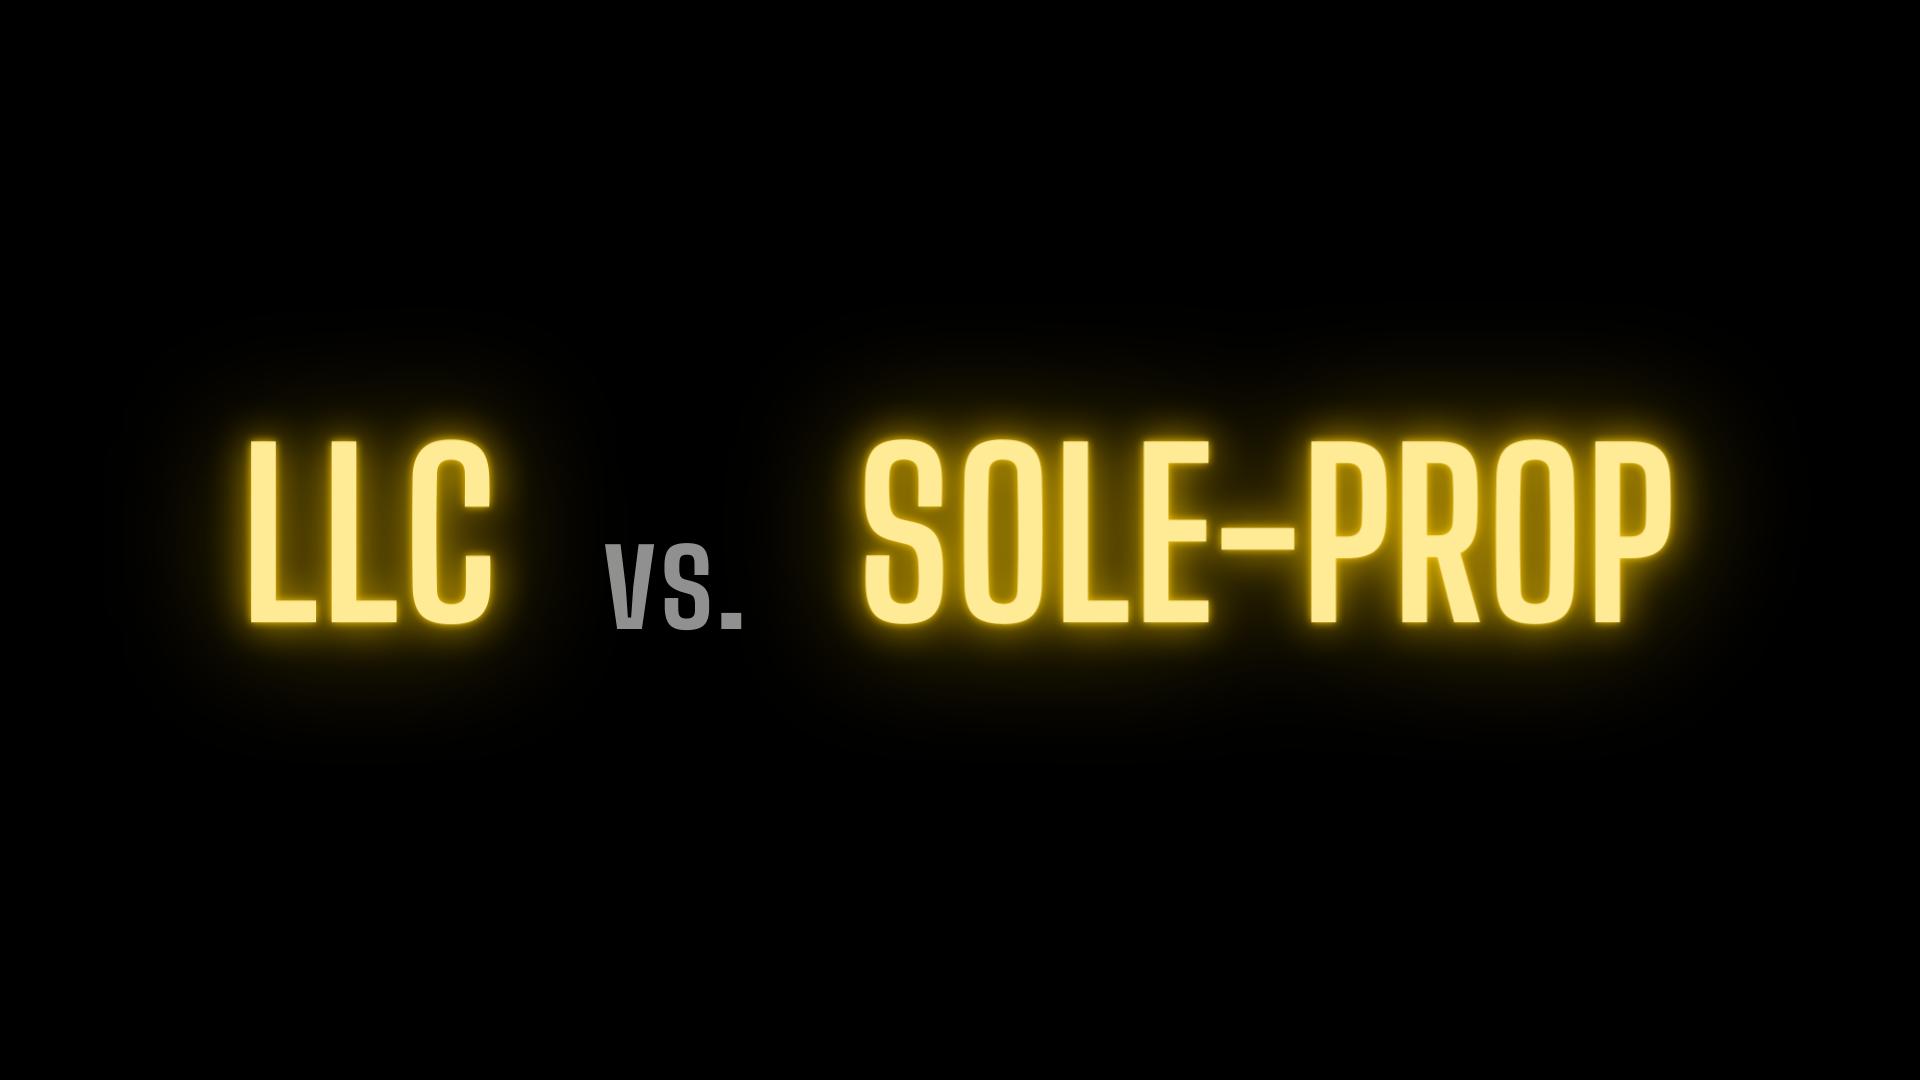 Benefits of LCC vs. Sole Proprietorship